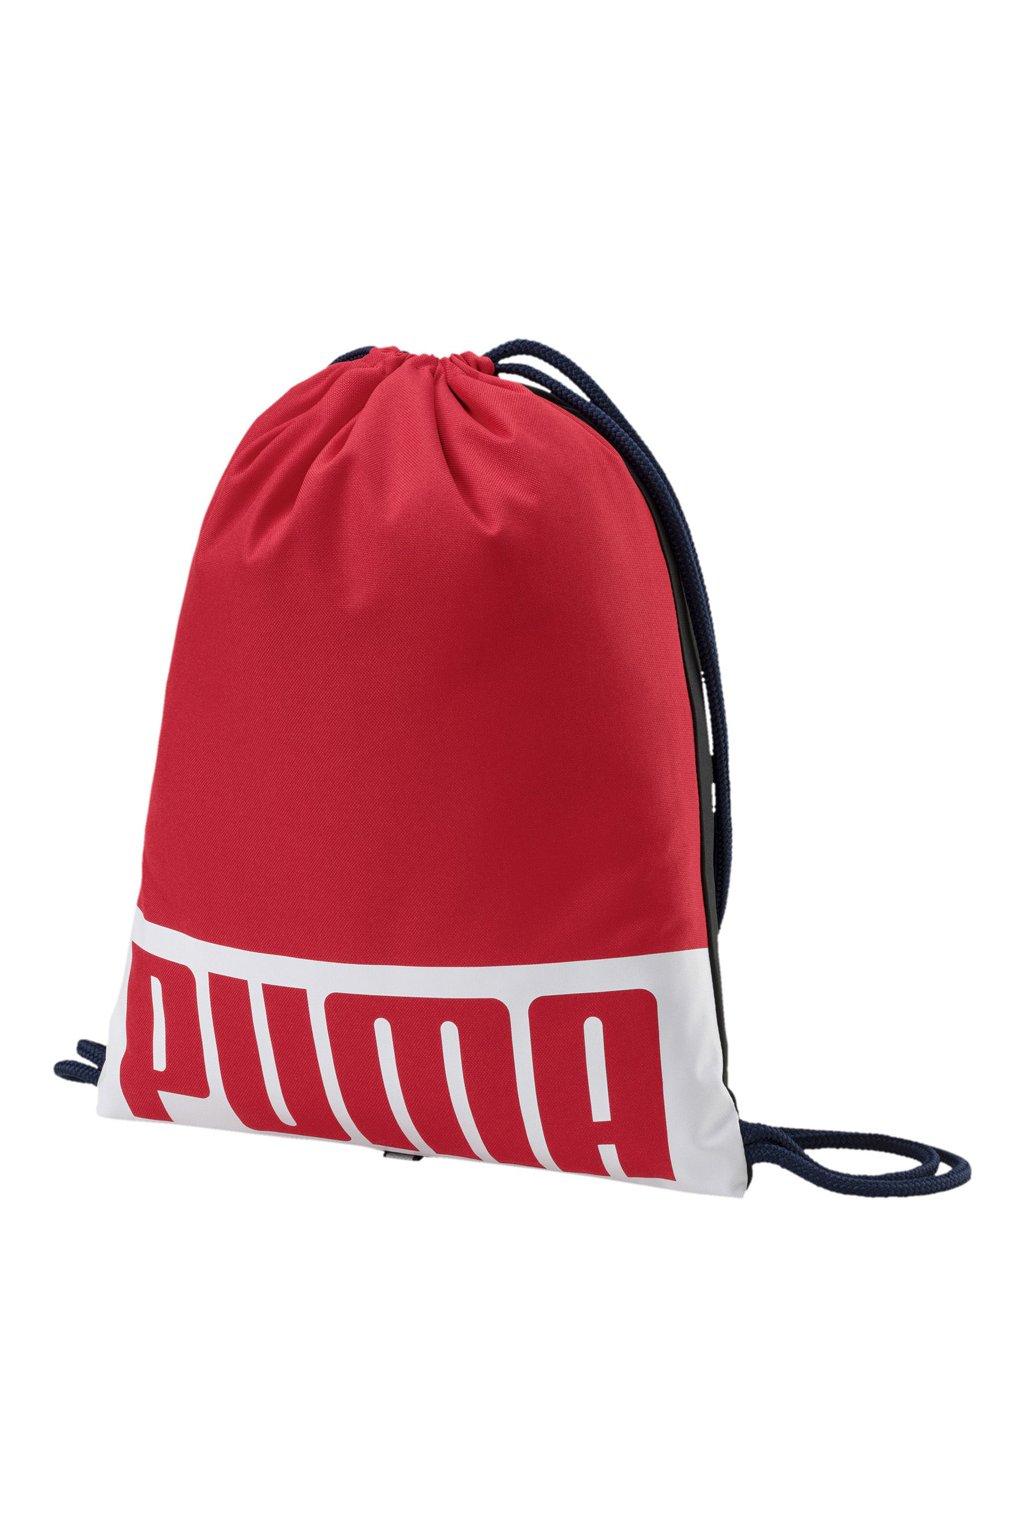 Vak Puma Deck Gym Sack červený 074961 11